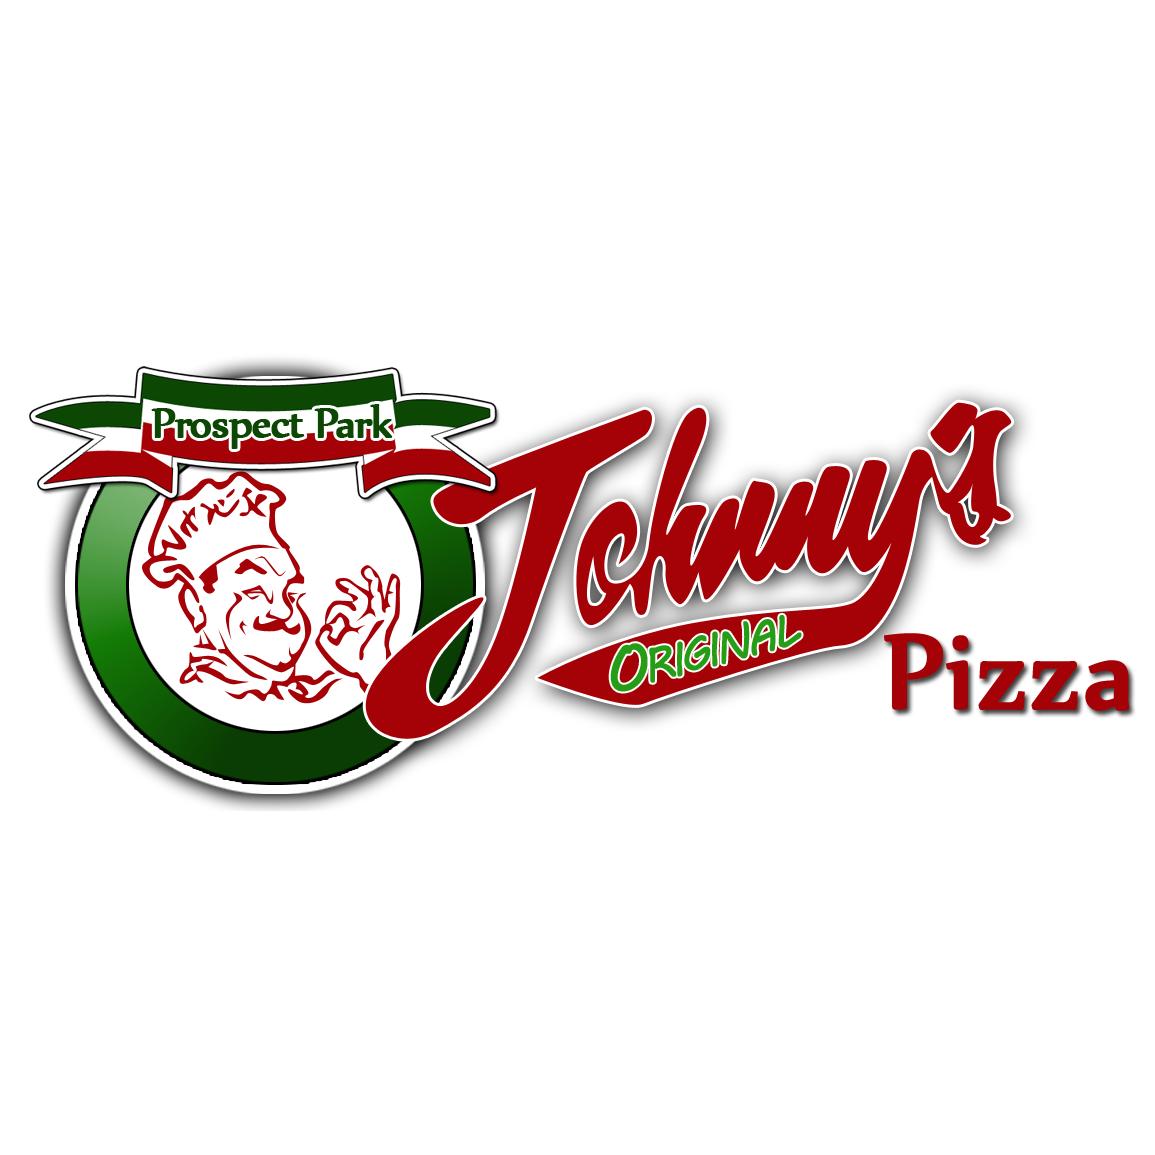 Johny's Original Pizza - Prospect Park, PA - Restaurants